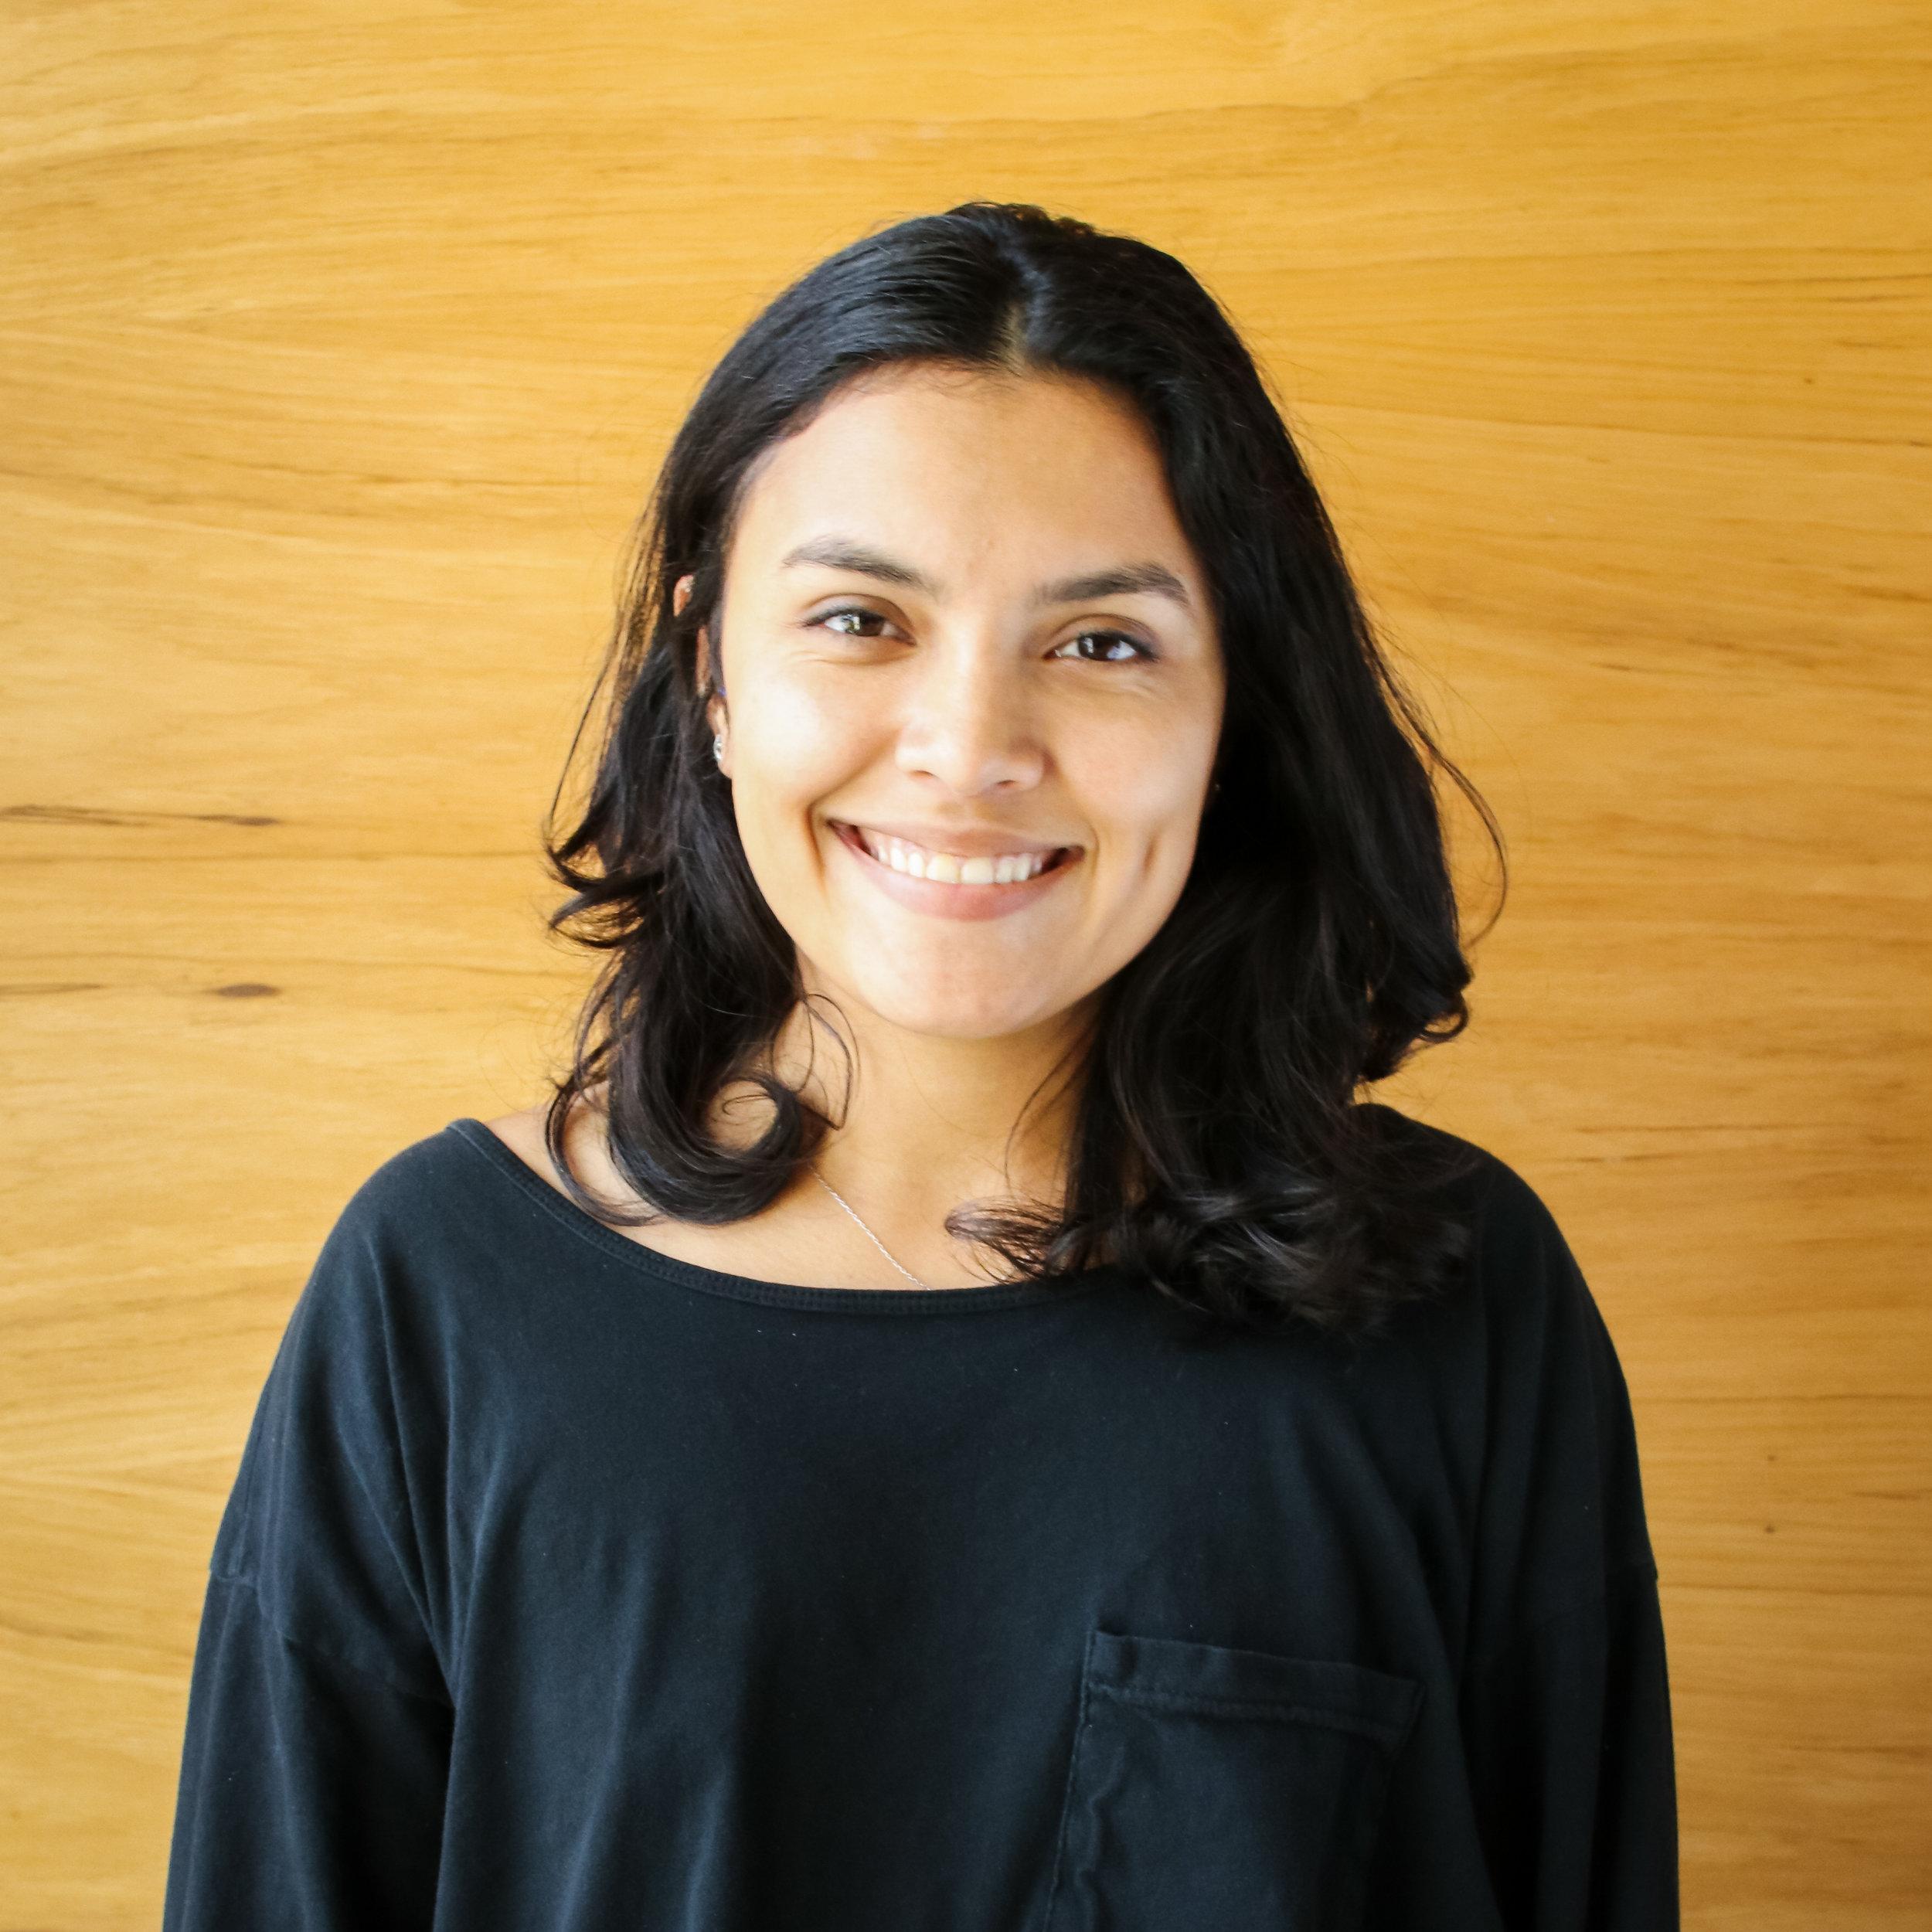 Maria Cuyan